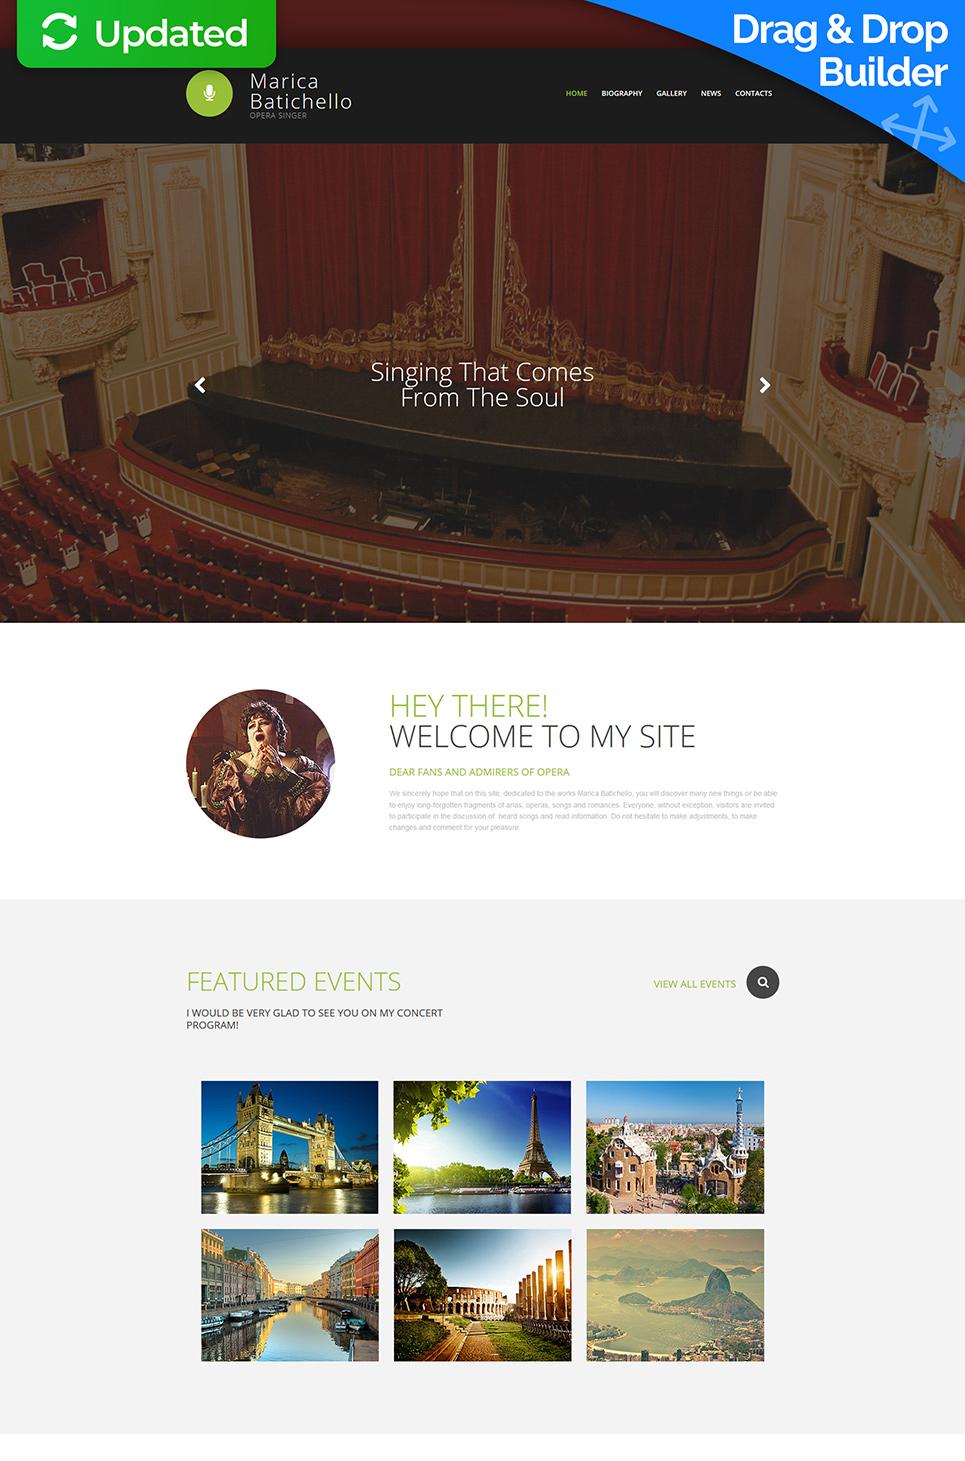 Web design for musical performer